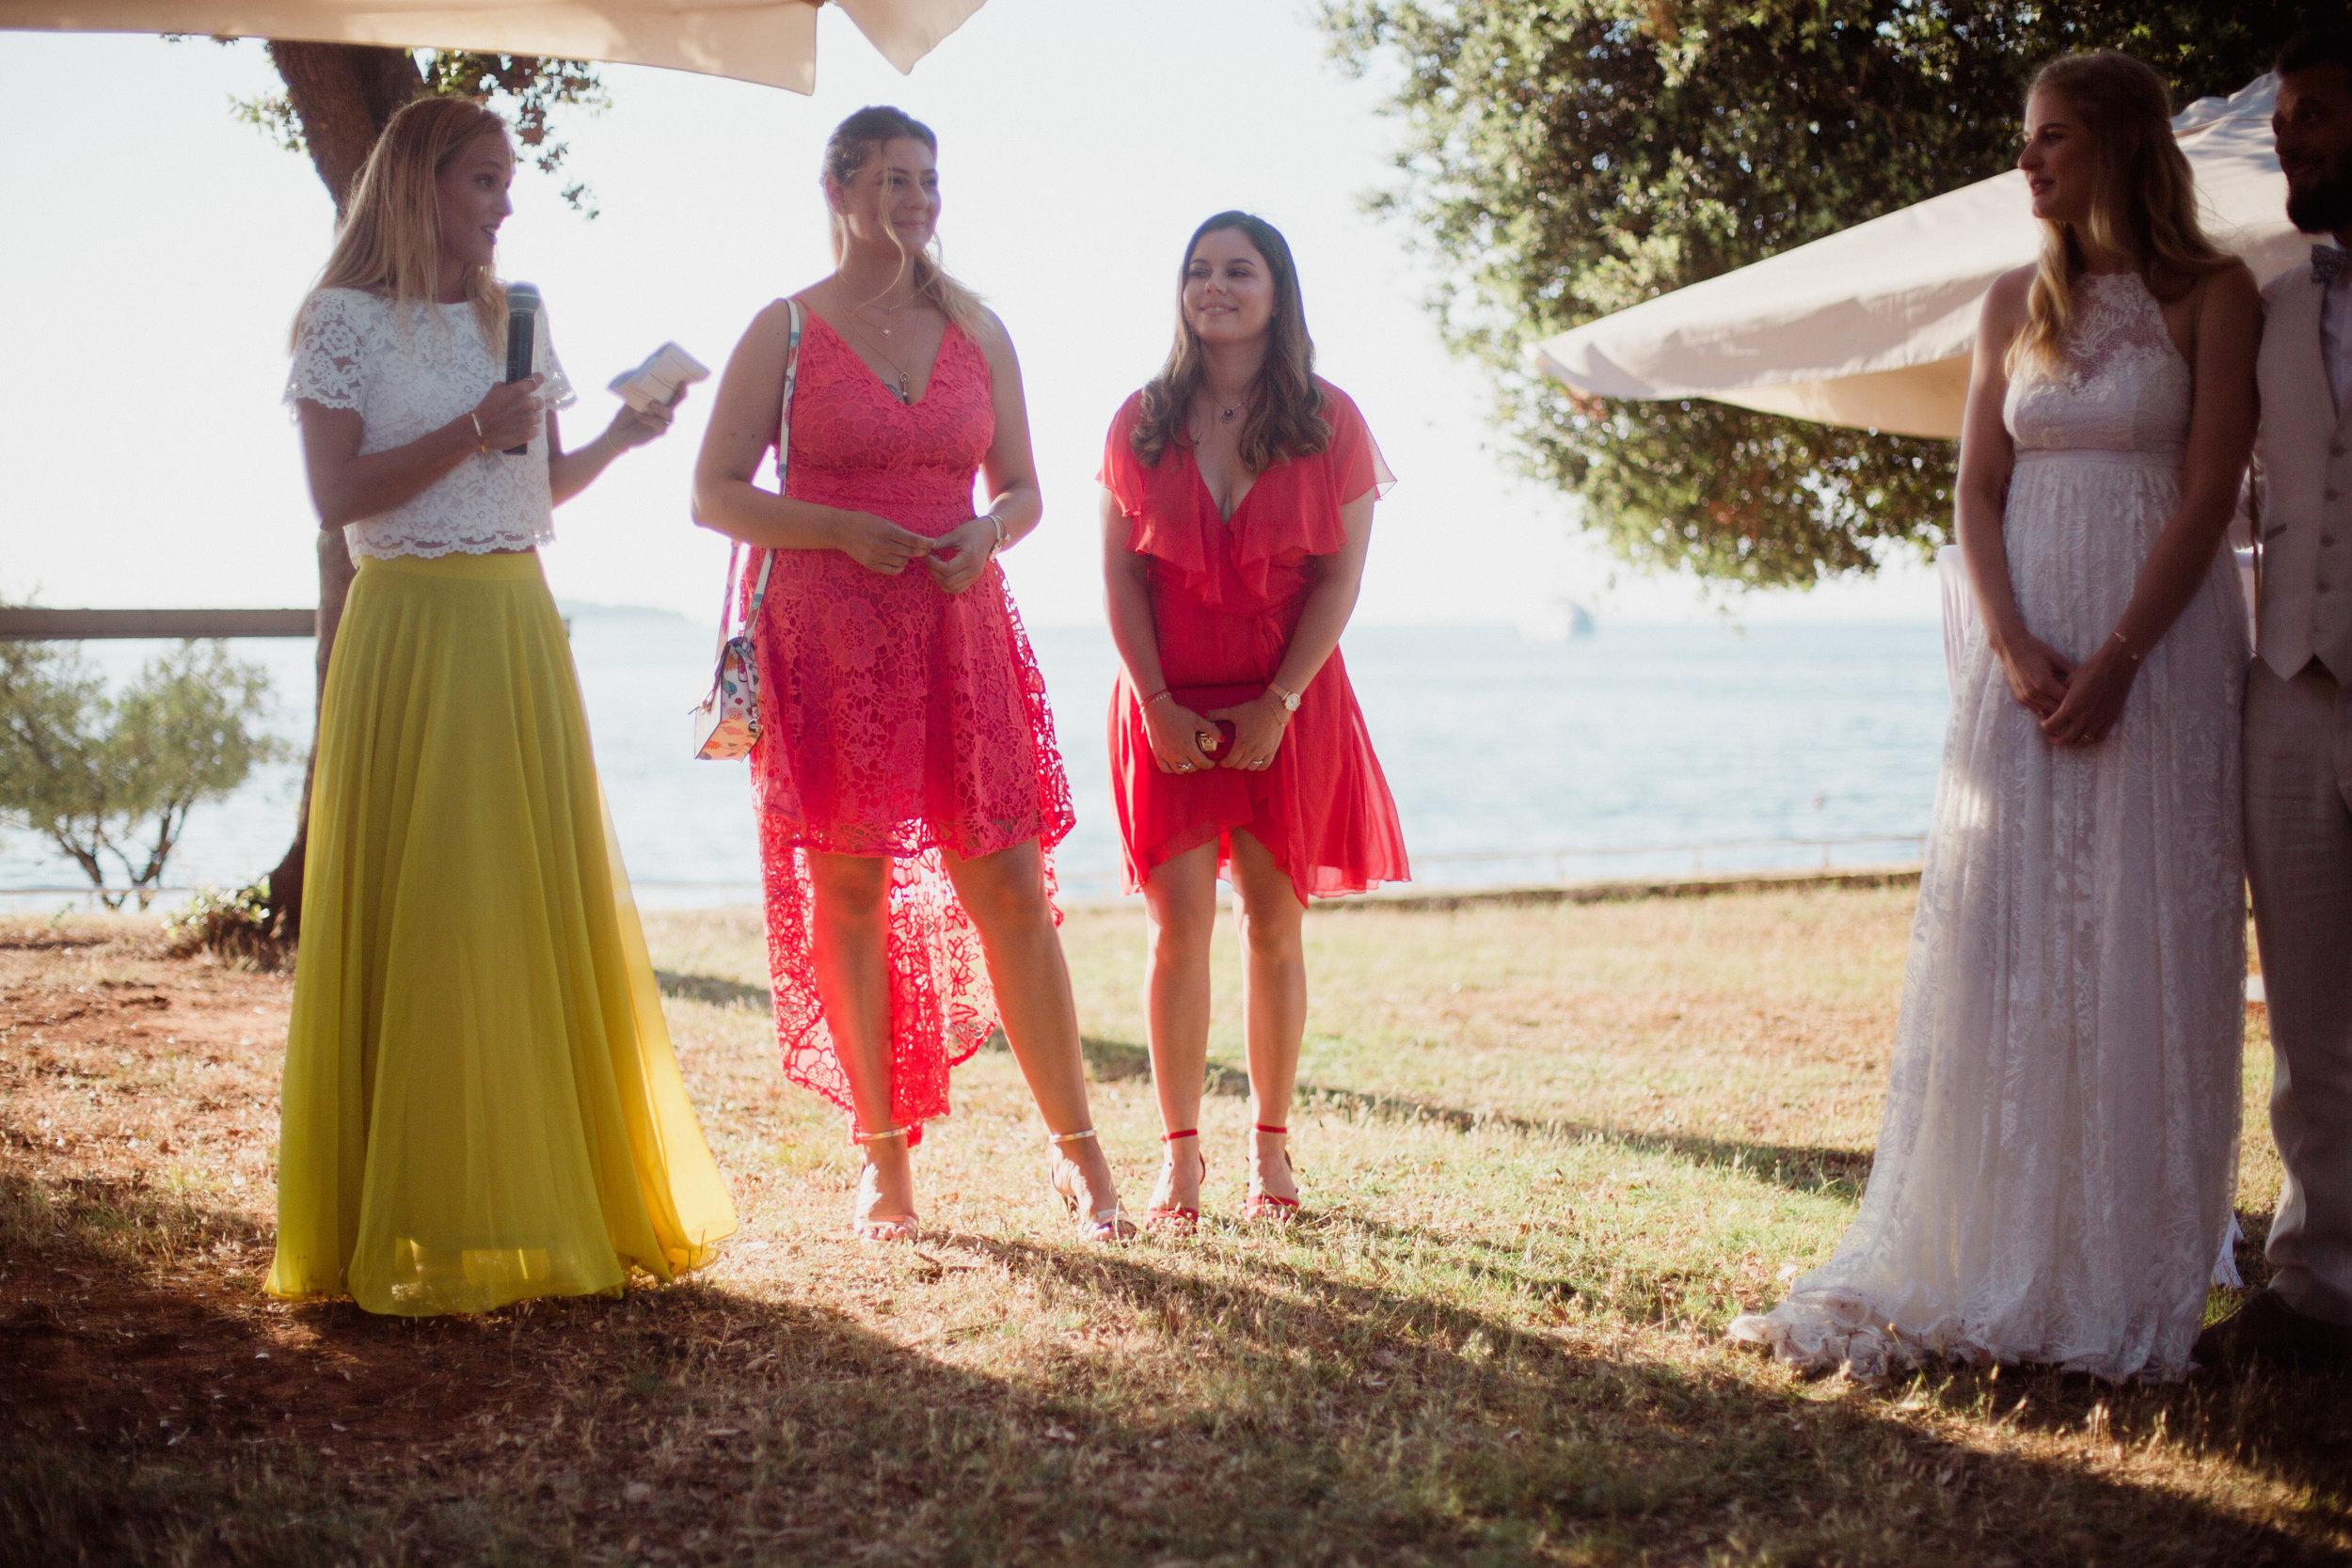 mariage-croatie-ile-brijuni-mariage-paris-onzieme-arrondissement-photographe-france-pauline-maroussia